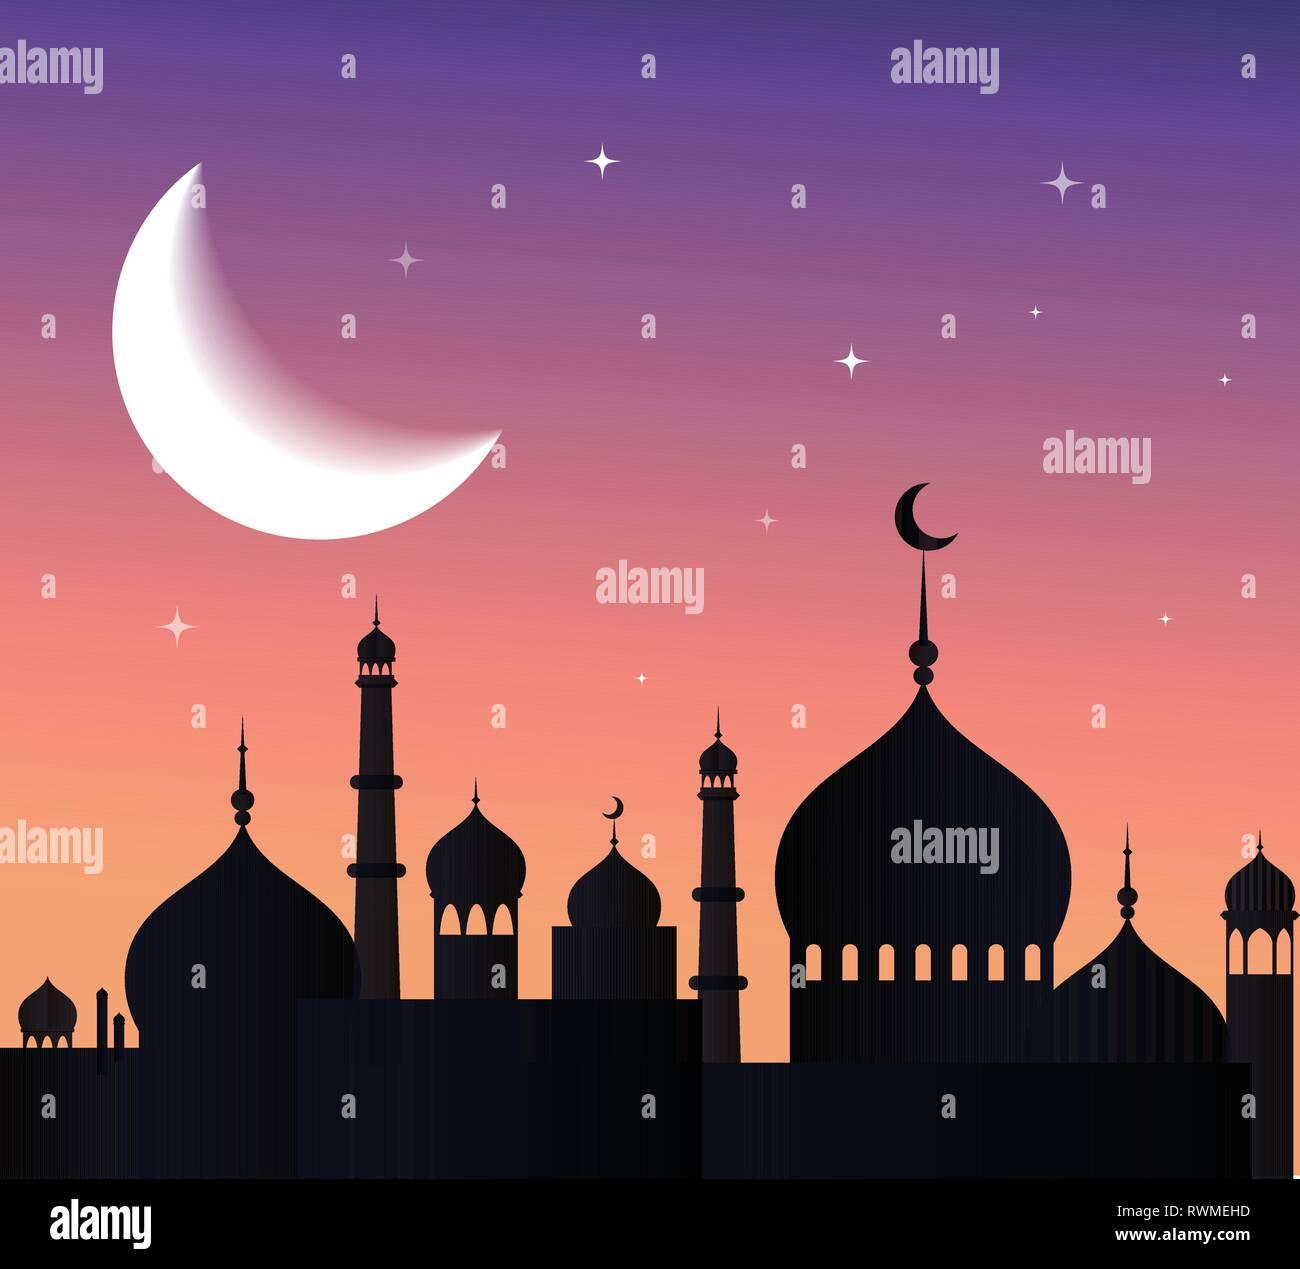 Ramadan kareem greeting card and banner  Islamic lantern on moon abd